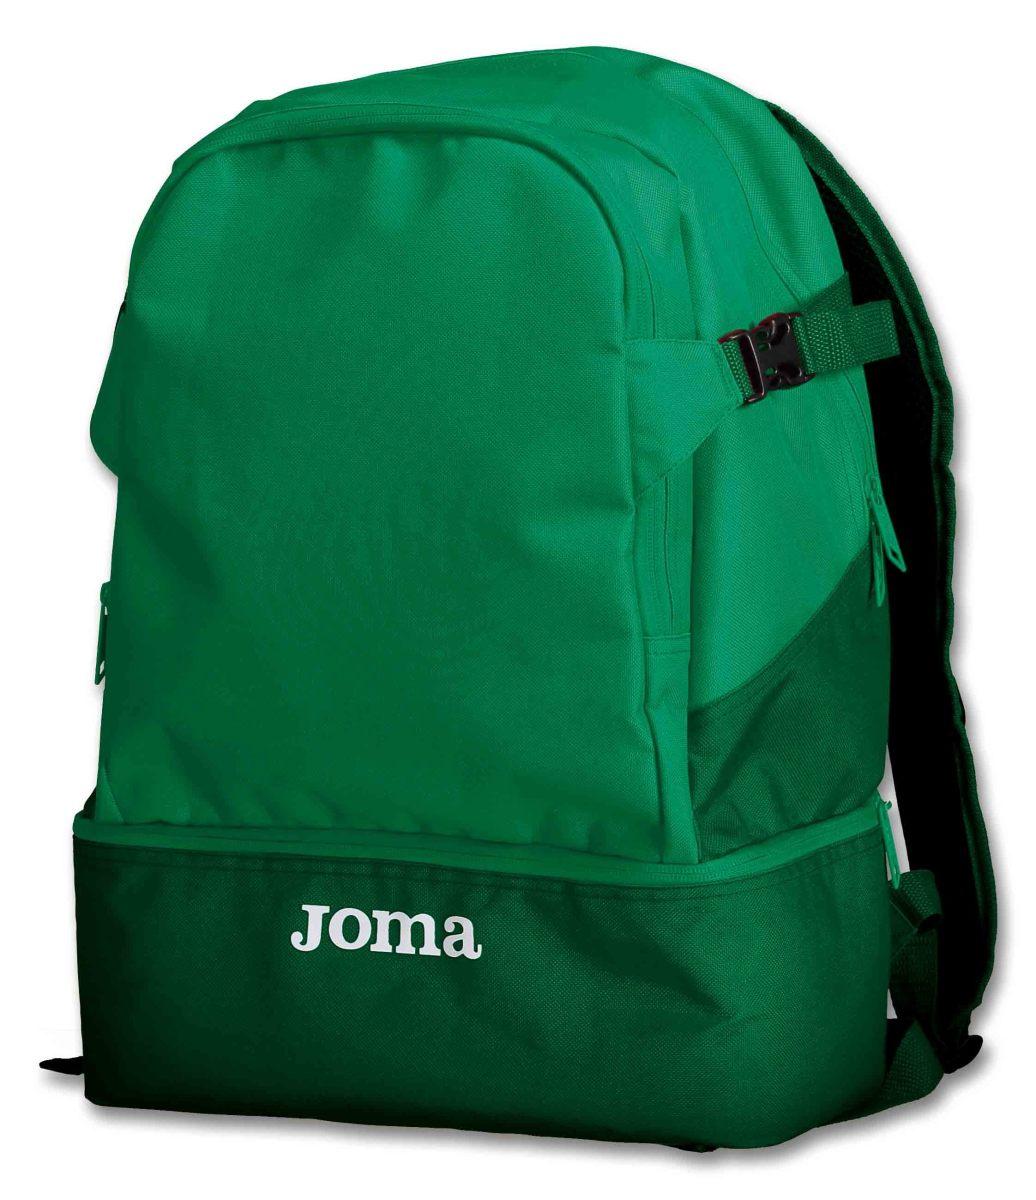 5a575e6011f Joma Estadio II Rucksack 5 Pack - Joma Football Bags   4Sports Group